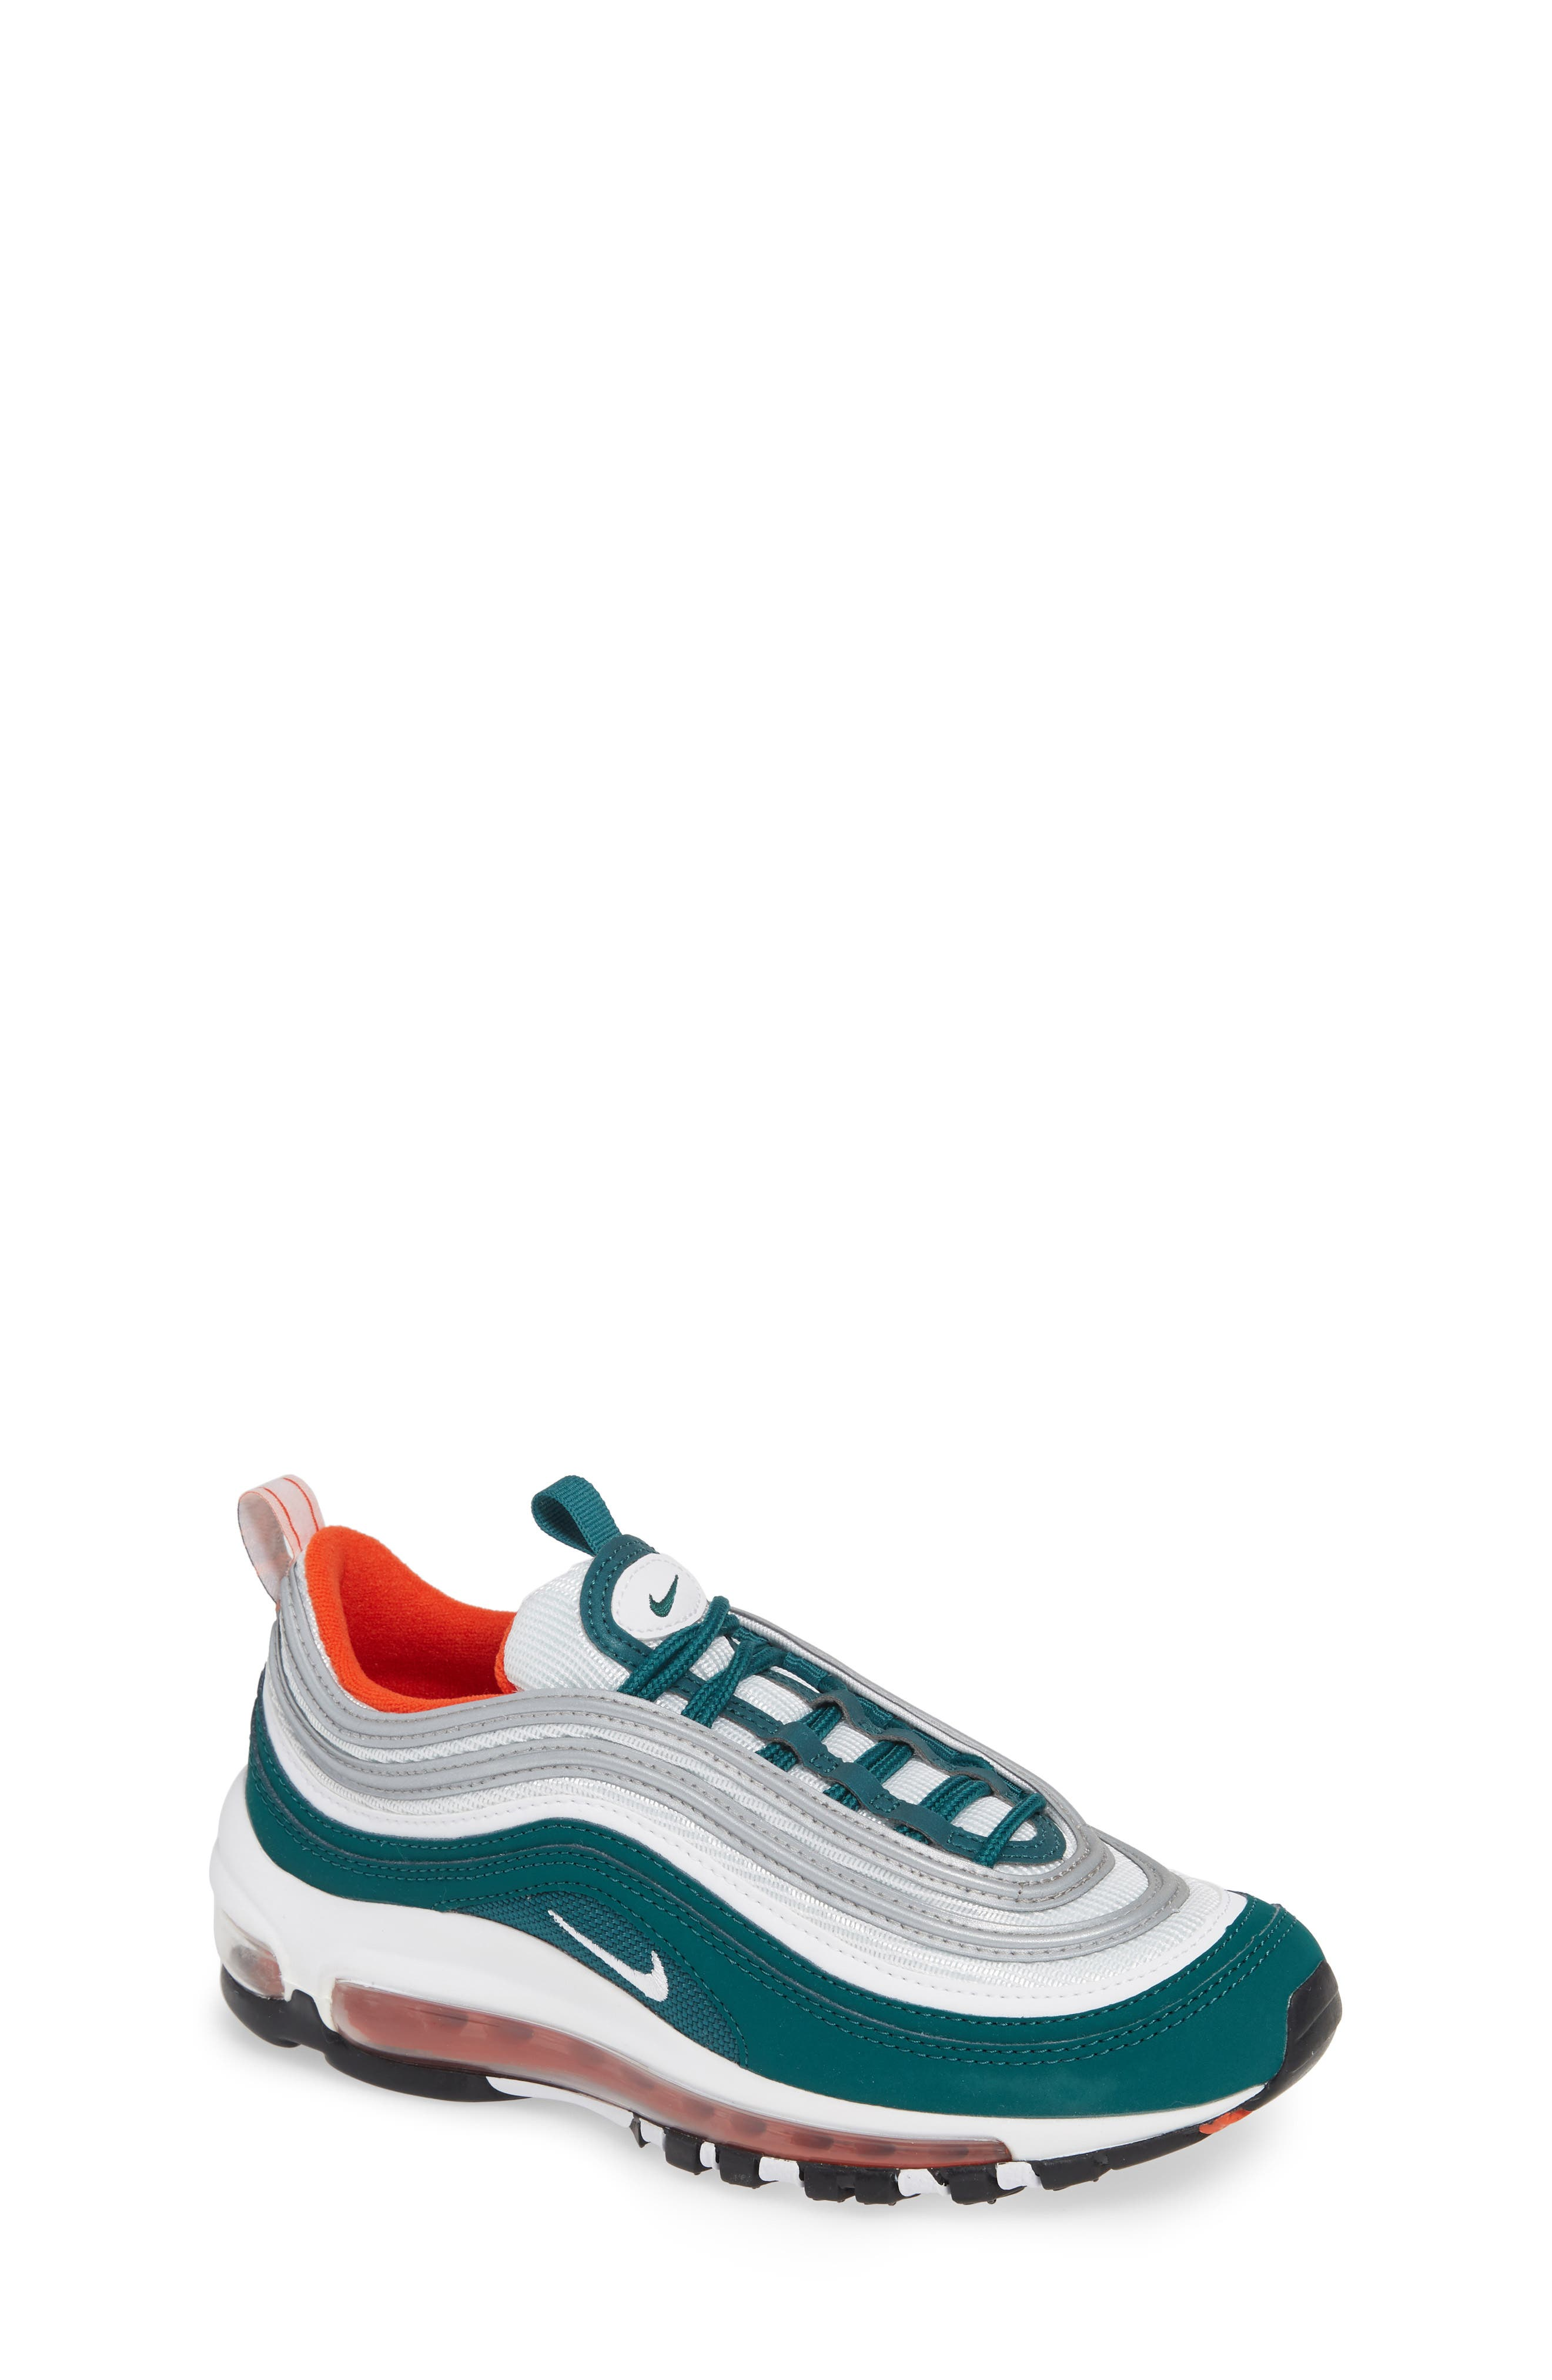 NIKE Air Max 97 Sneaker, Main, color, RAINFOREST/ WHITE/ ORANGE